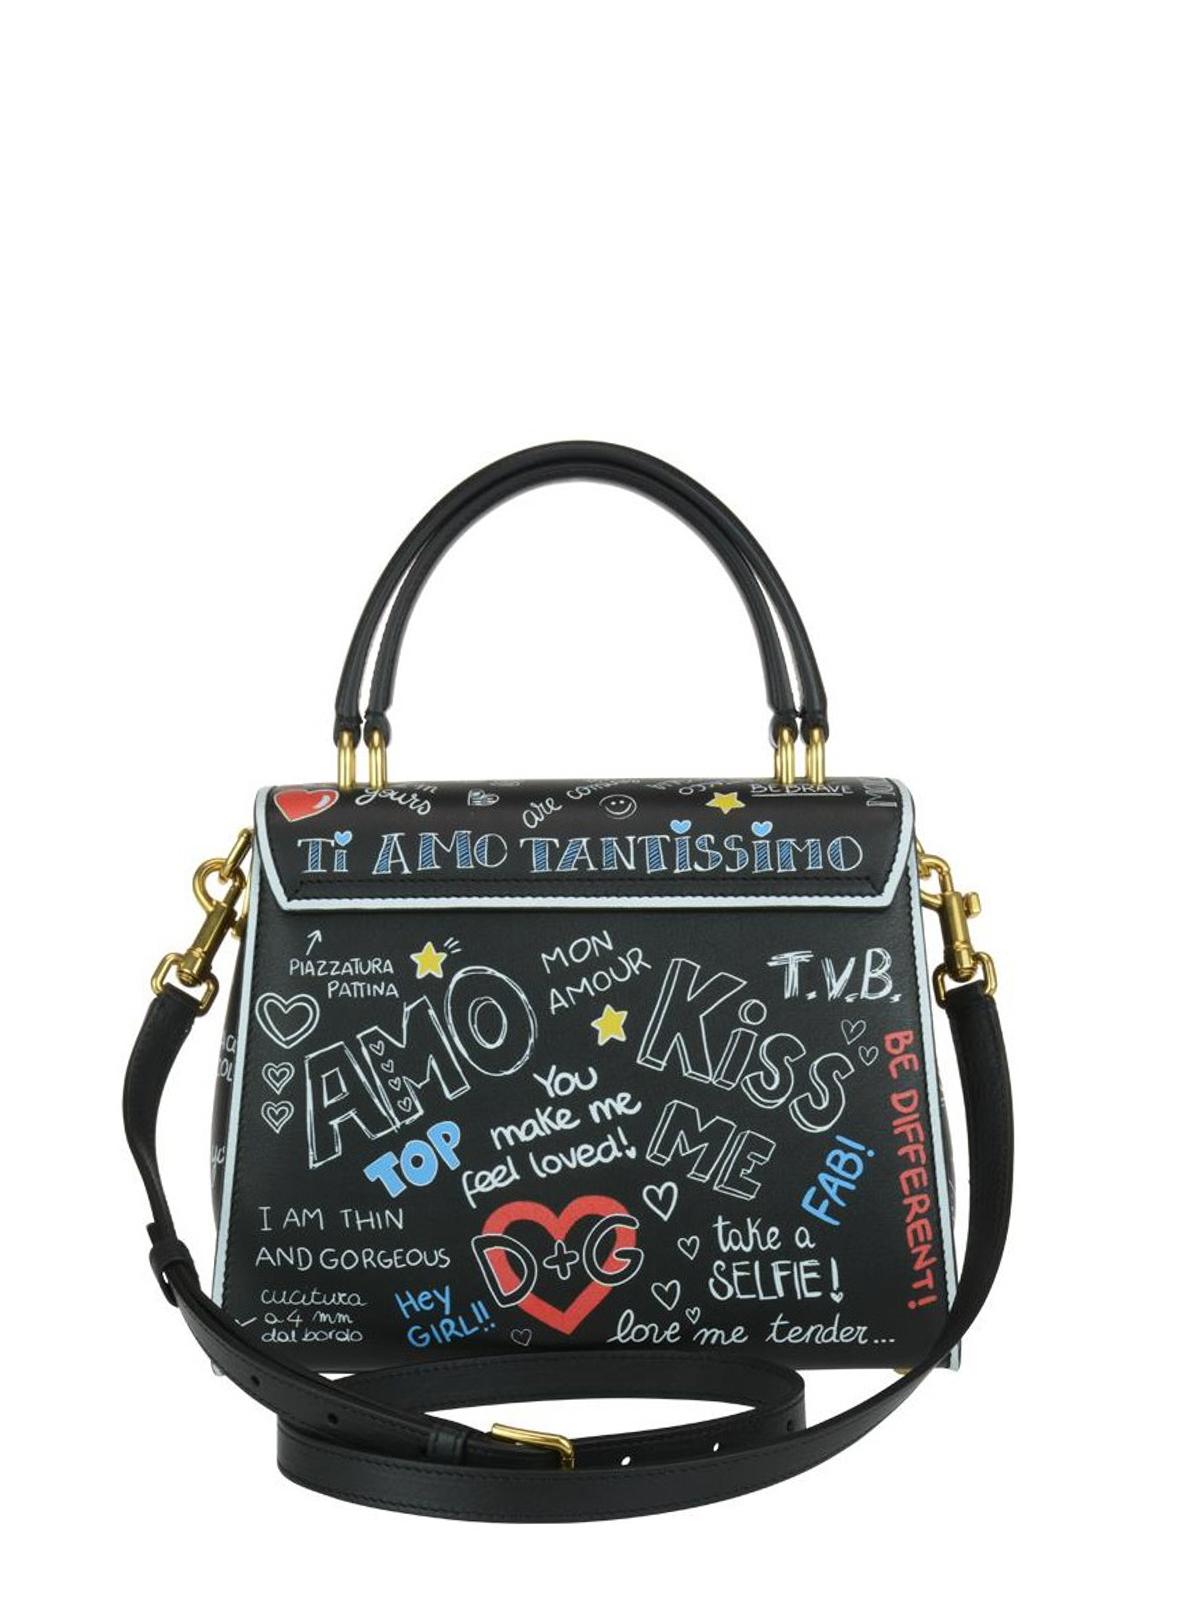 iKRIX DOLCE   GABBANA  cross body bags - Welcome mural print leather handbag 69010dc18d4b8